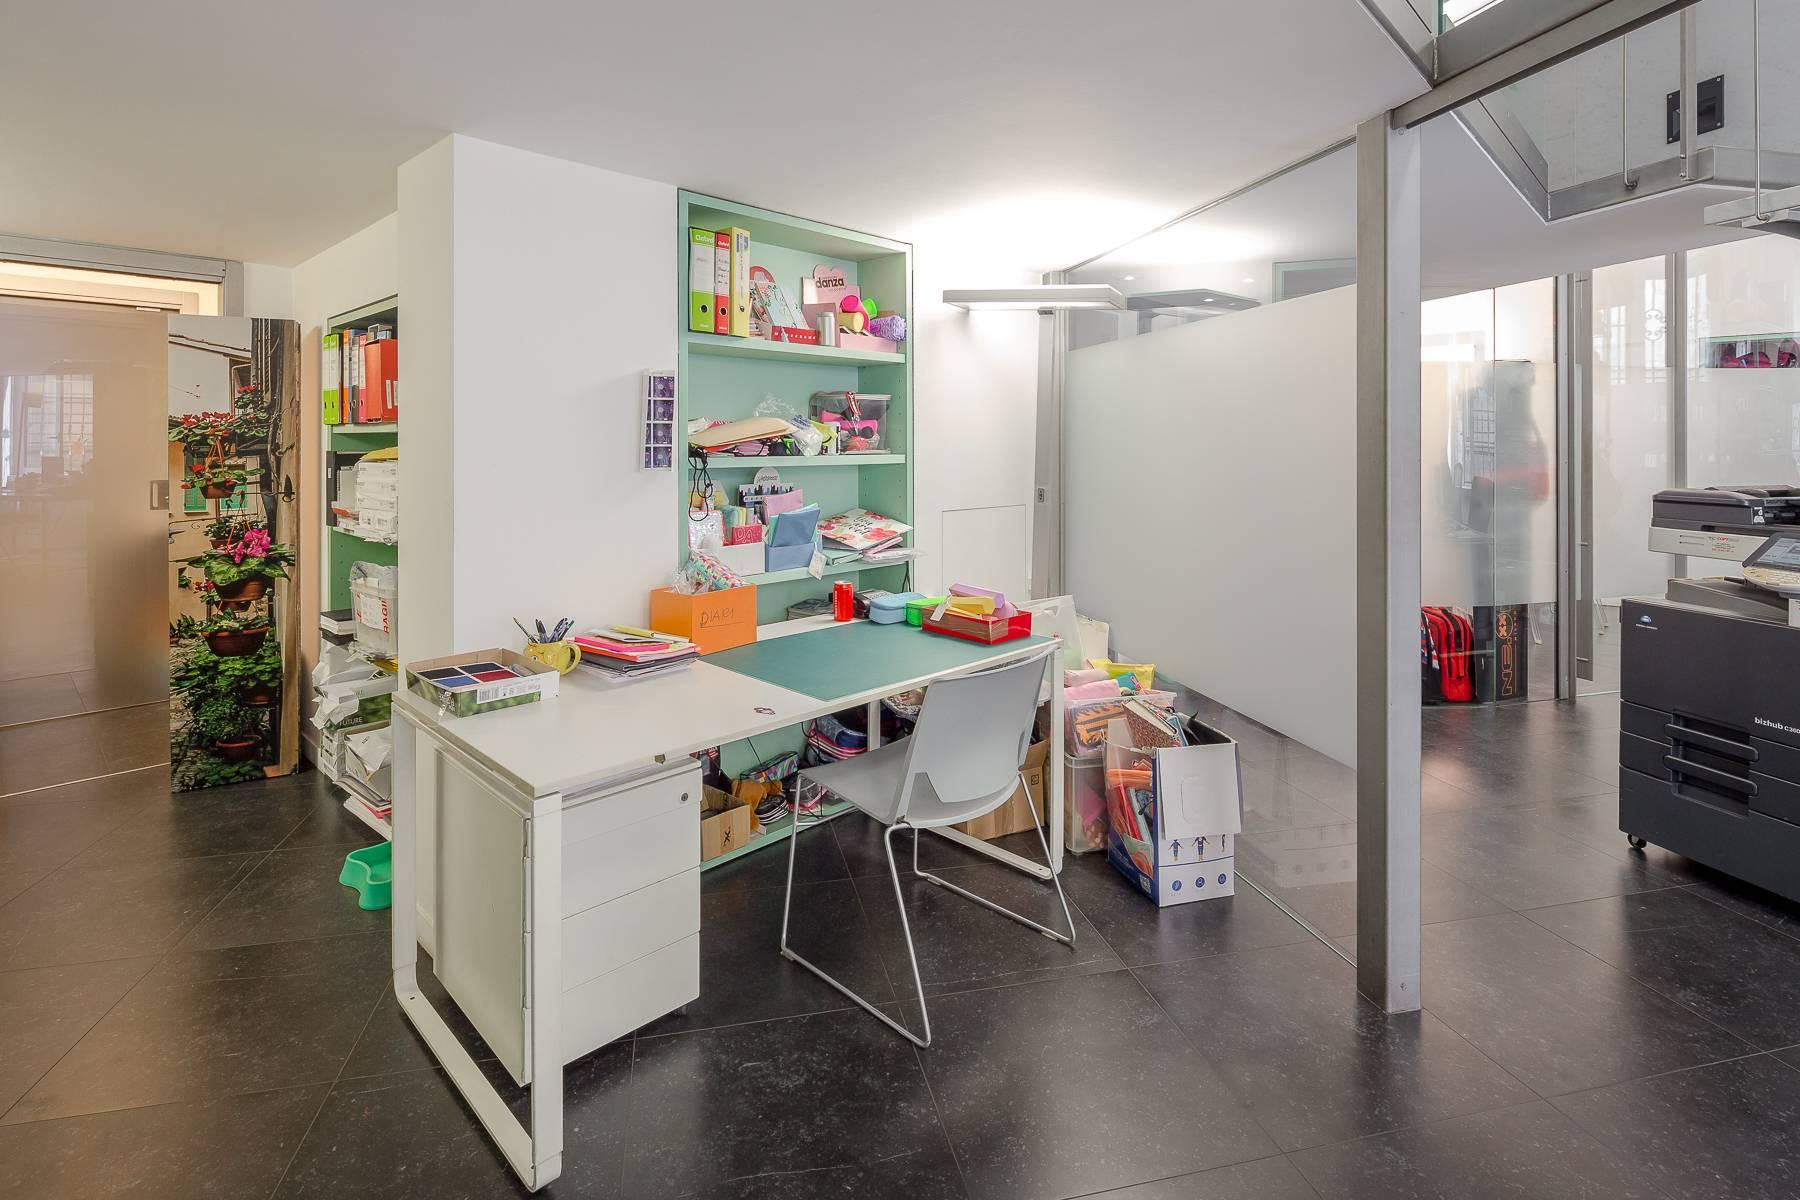 Open space office/residential property in Piazza Giovine Italia/Via Aurelio Saffi - 11